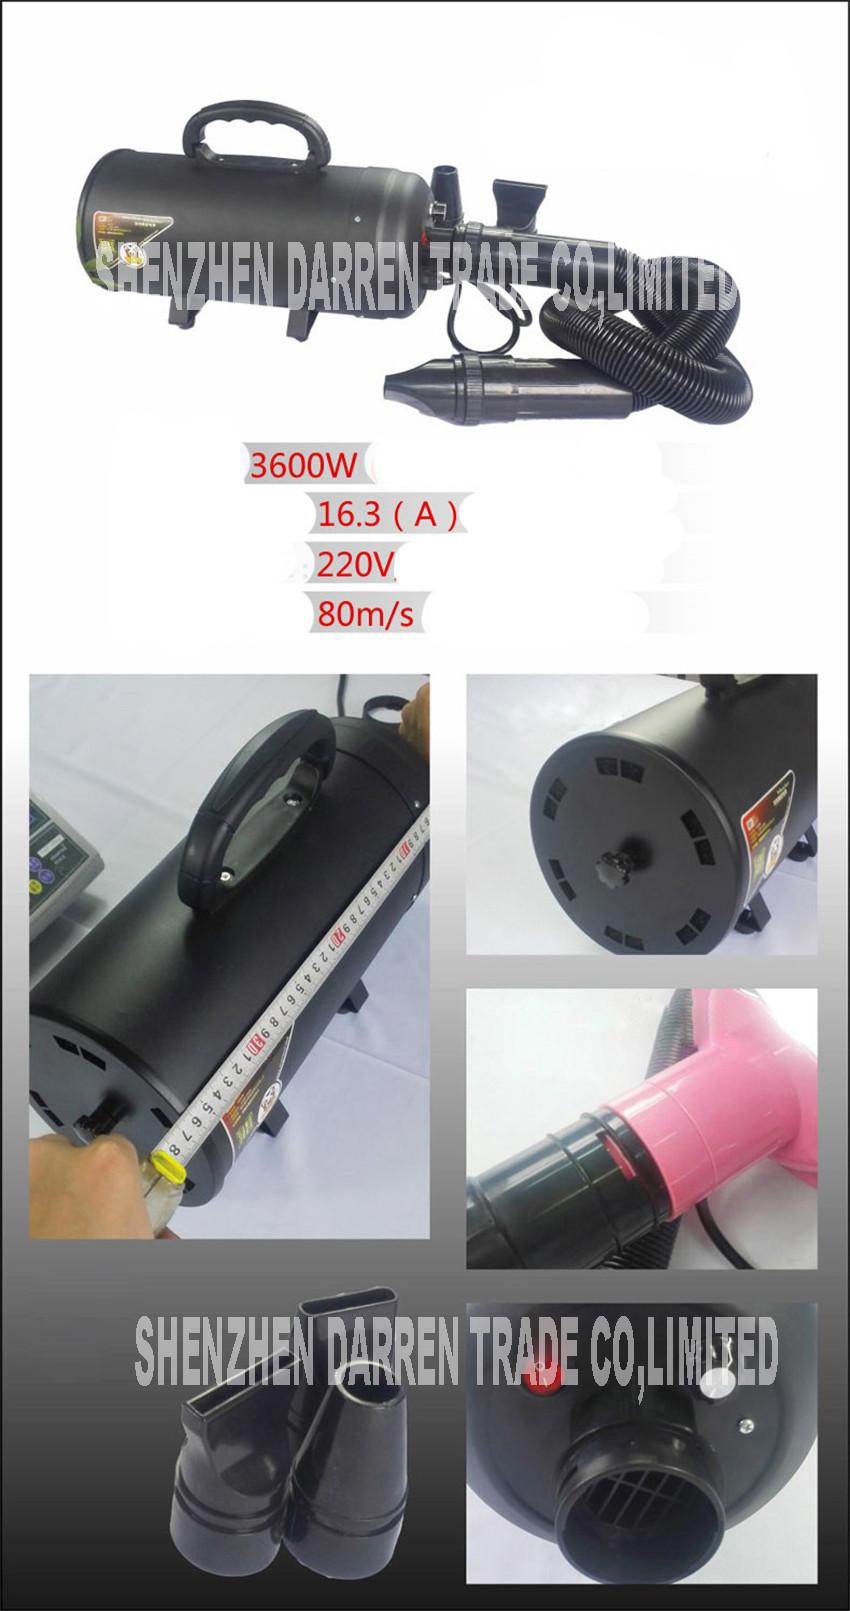 3pcs  Hair Dryer  High Power Motor Double Engine Hair Dryer Pet Grooming Dog 220 v   3600 w